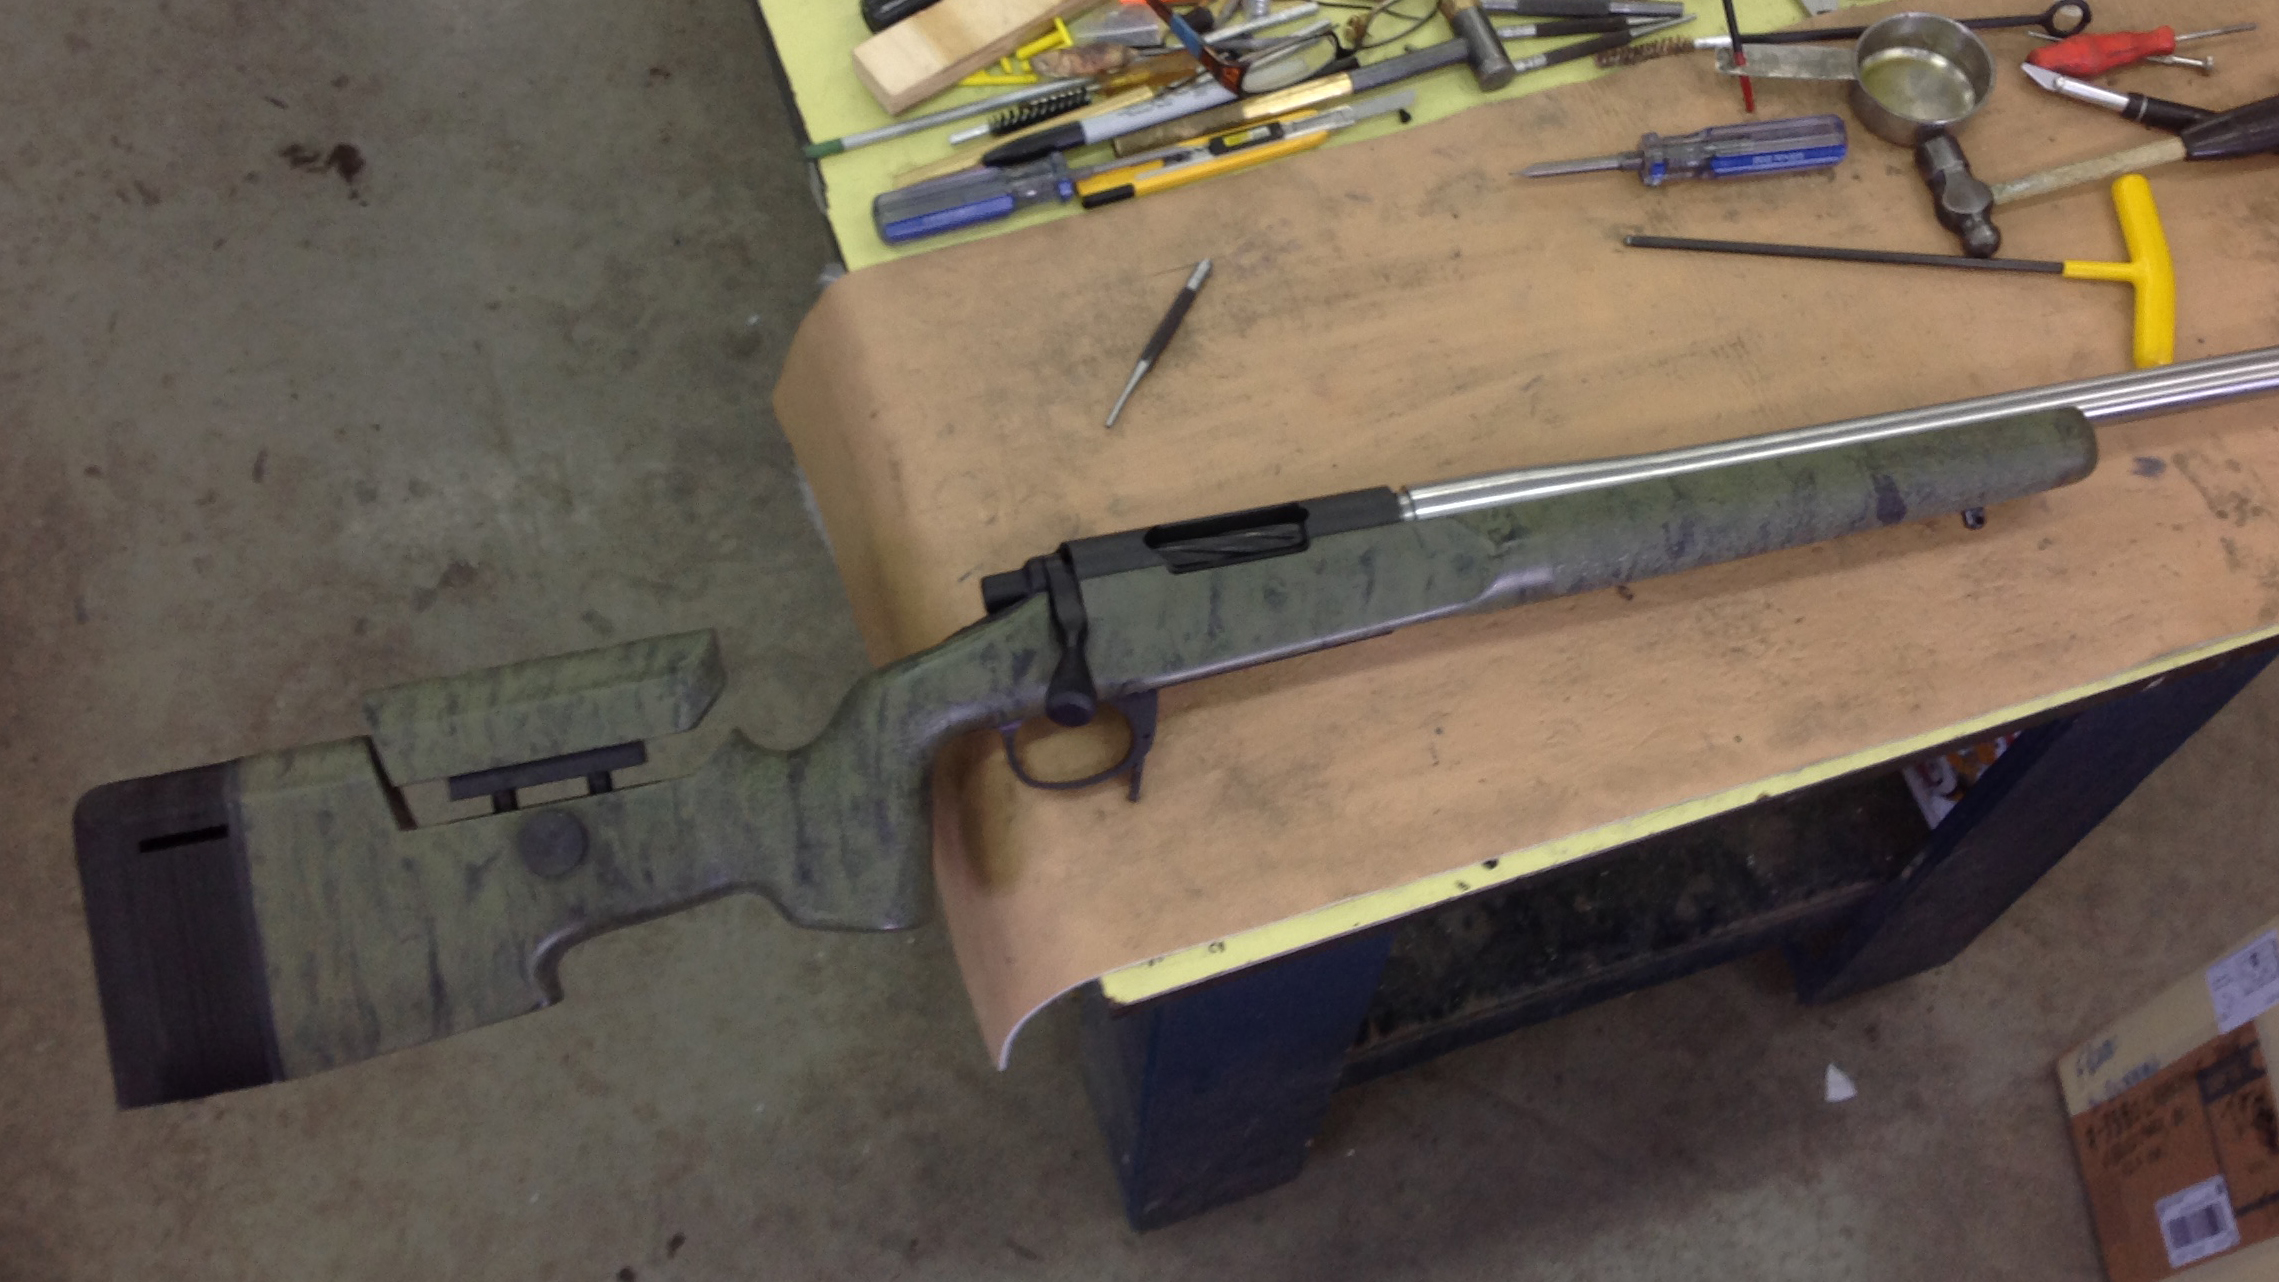 6mm creedmoor mcmillan a-5 ajustable